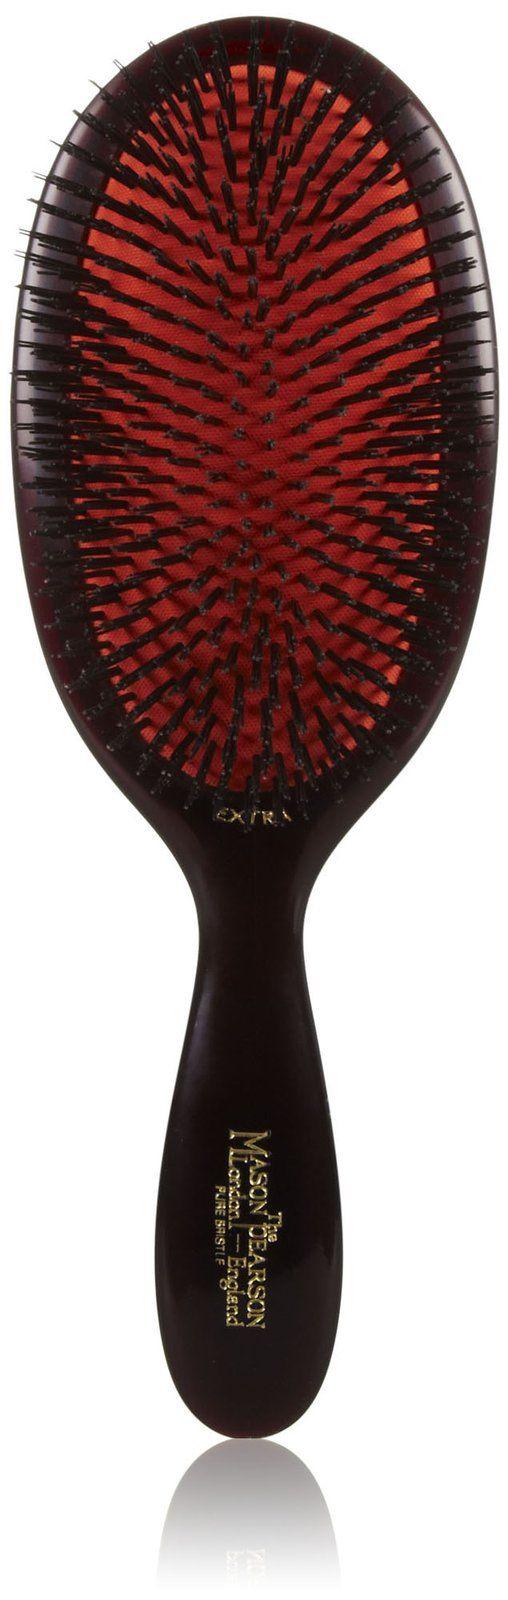 Mason Pearson Extra Large Boar Bristle Hair Brush, Ruby